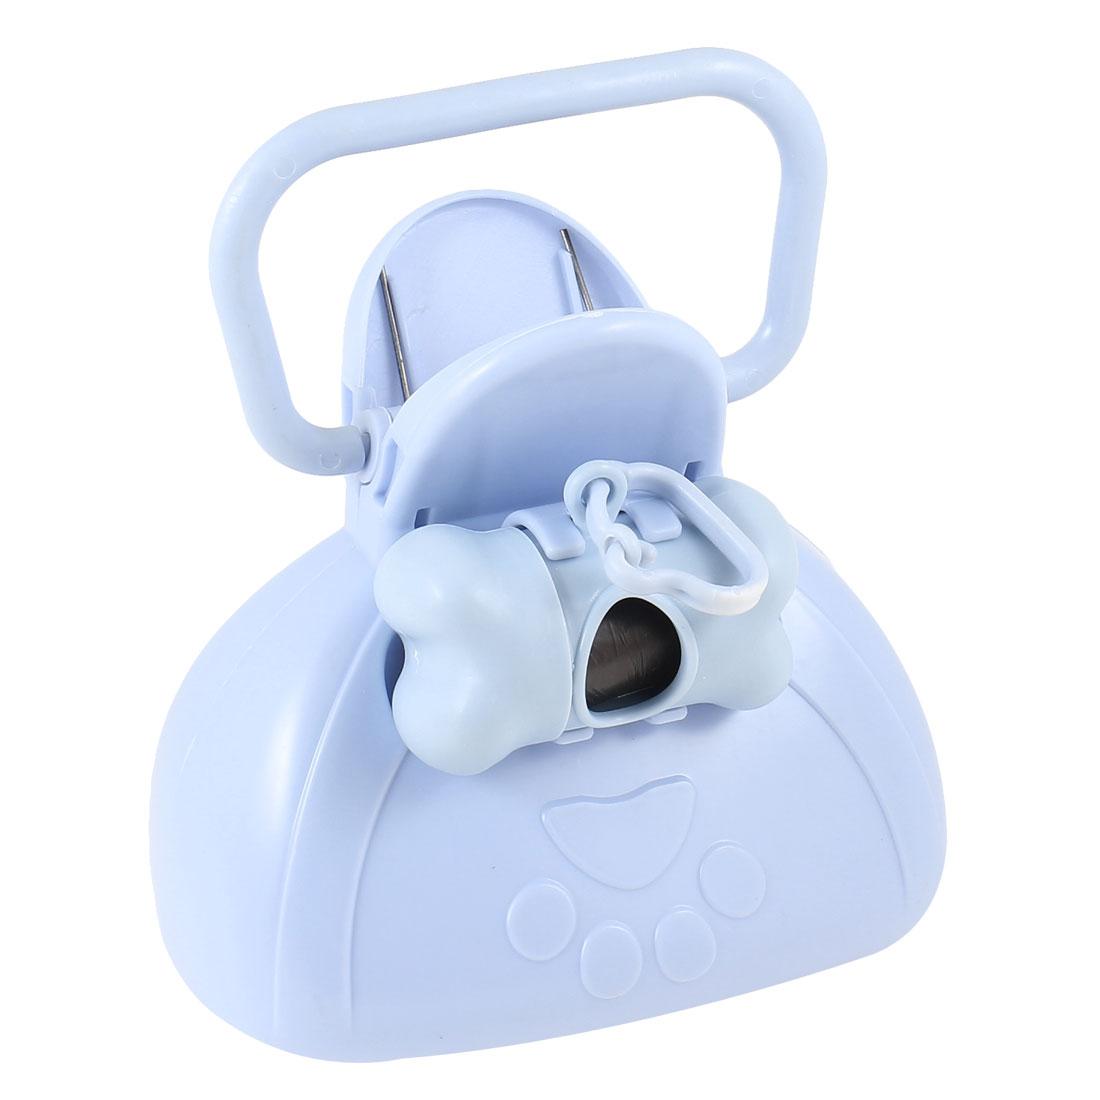 2 in 1 Protable Pet Dog Cat Light Blue Pooper Scooper Tool w Dispenser Box